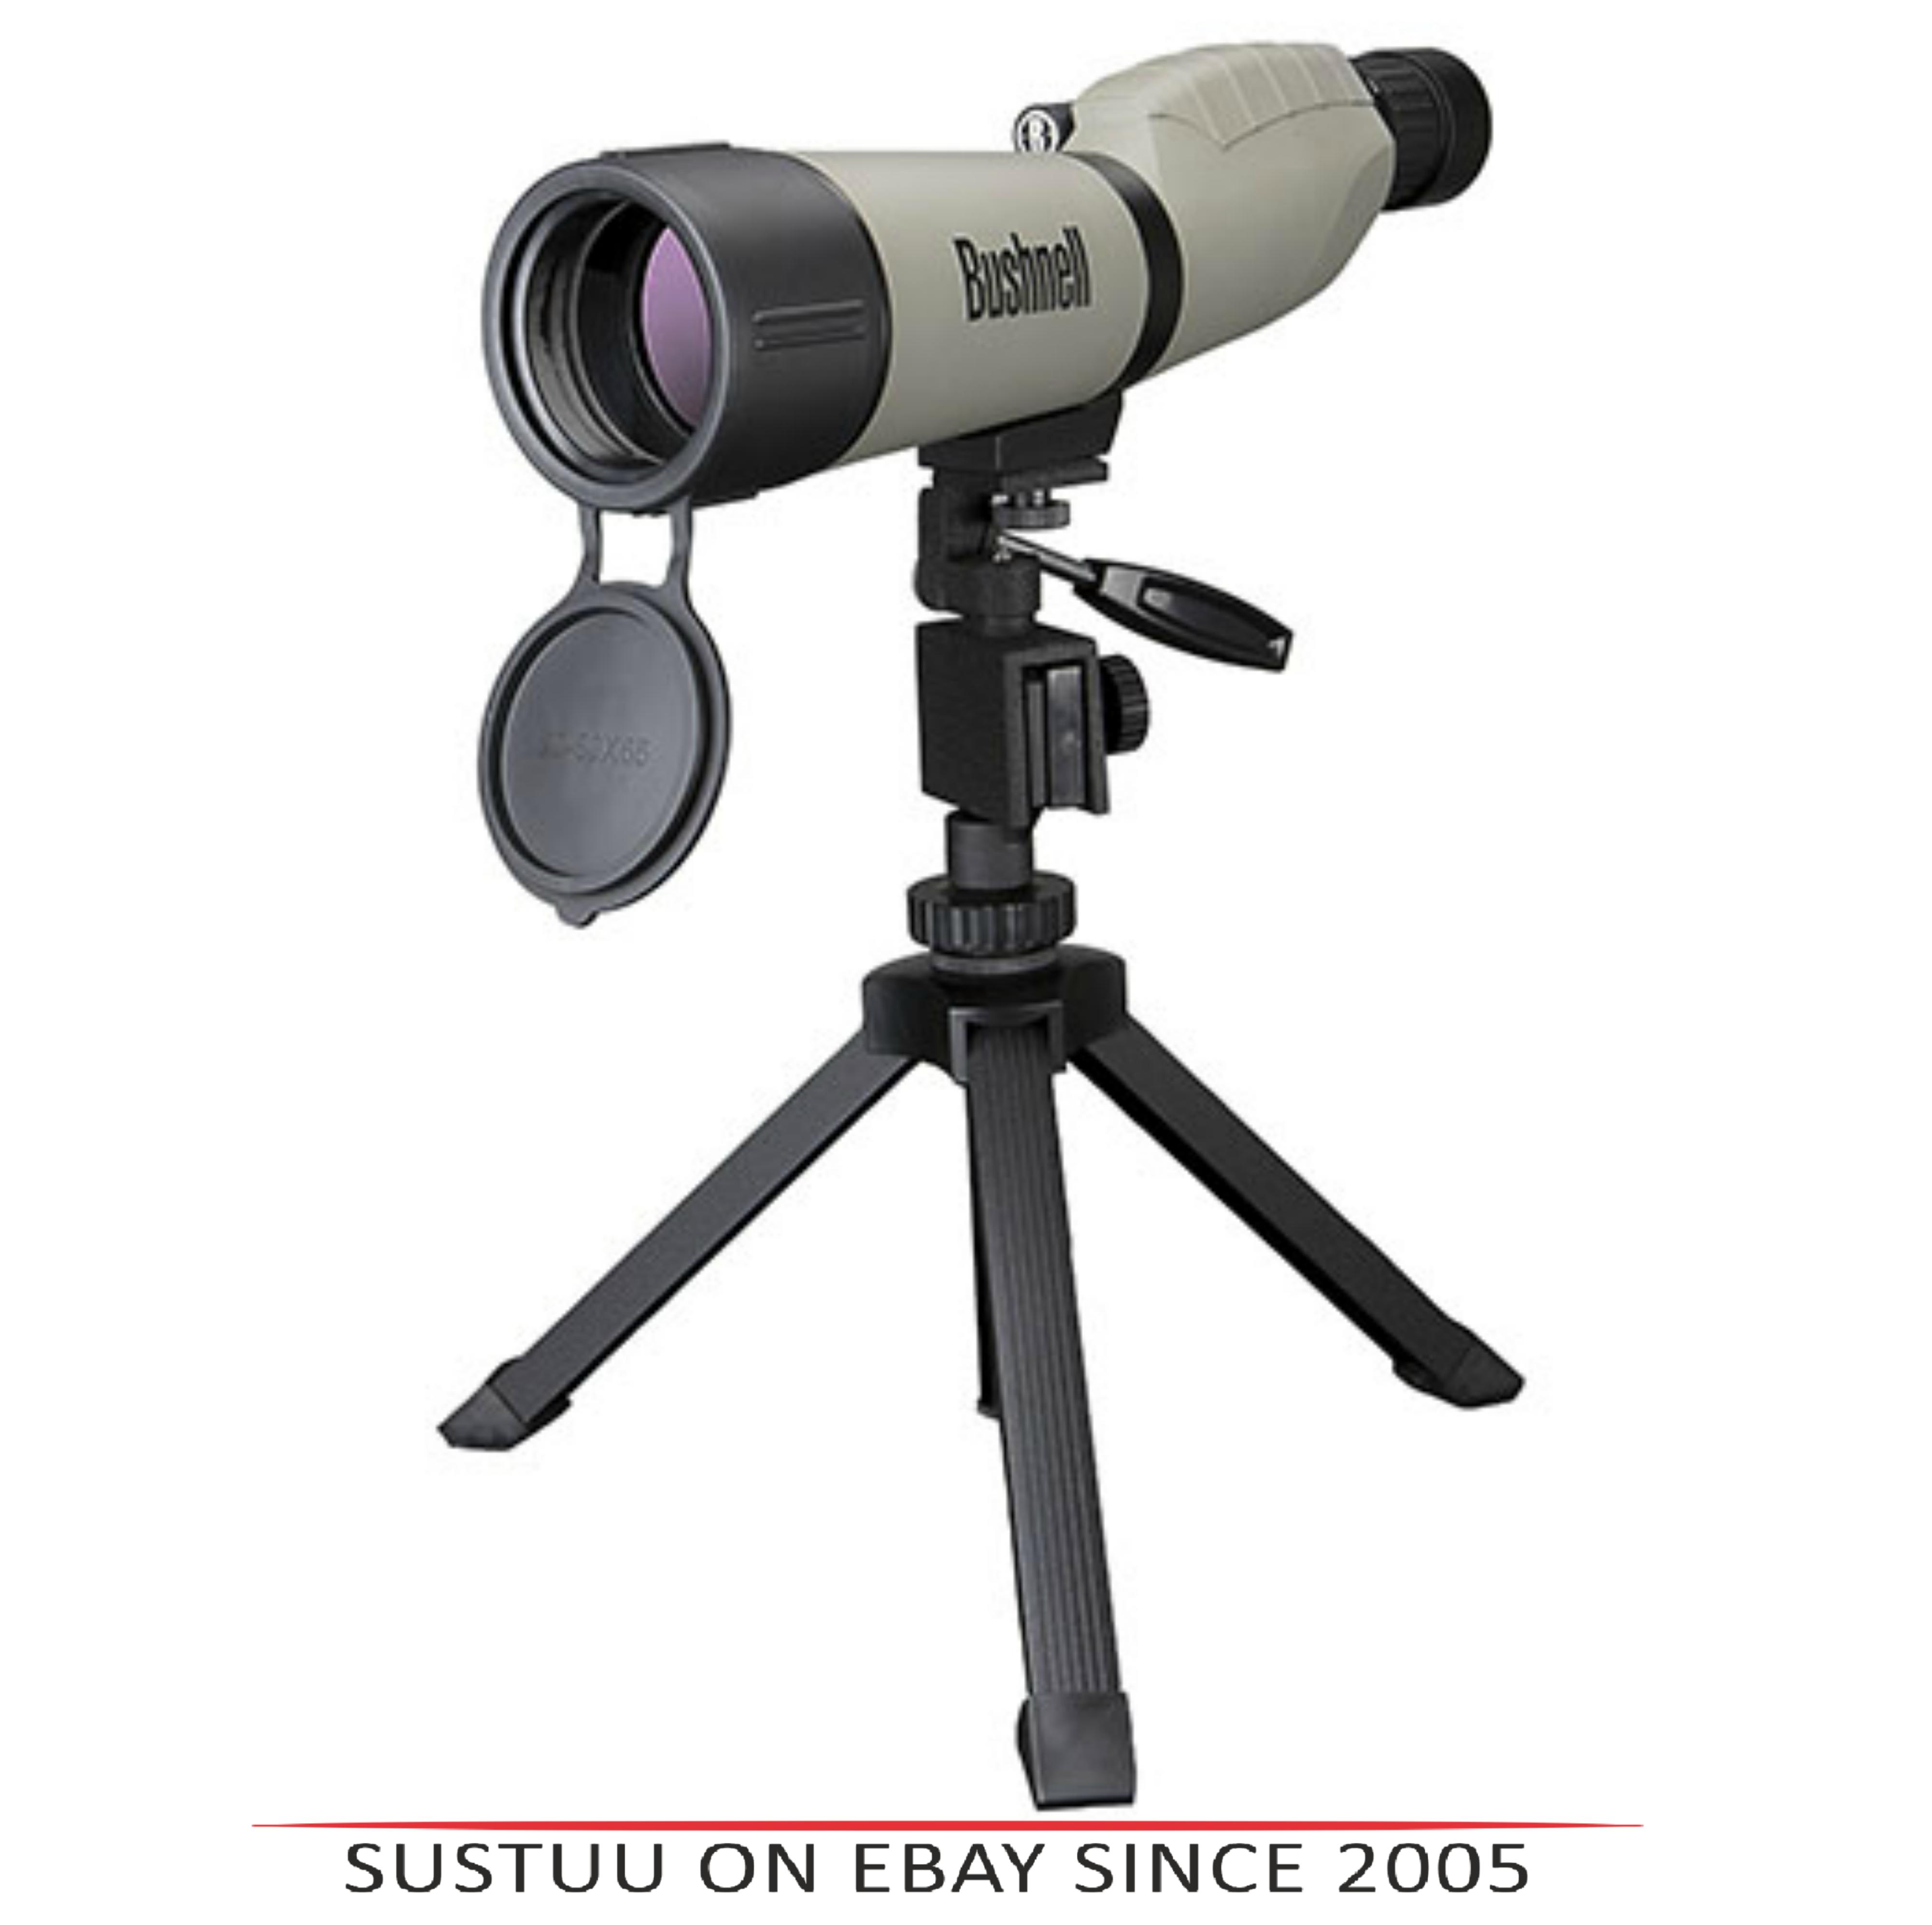 Bushnell Natureview Spotting Scope|Fogproof &Waterproof|15-45x 50mm BaK-4 Prisms